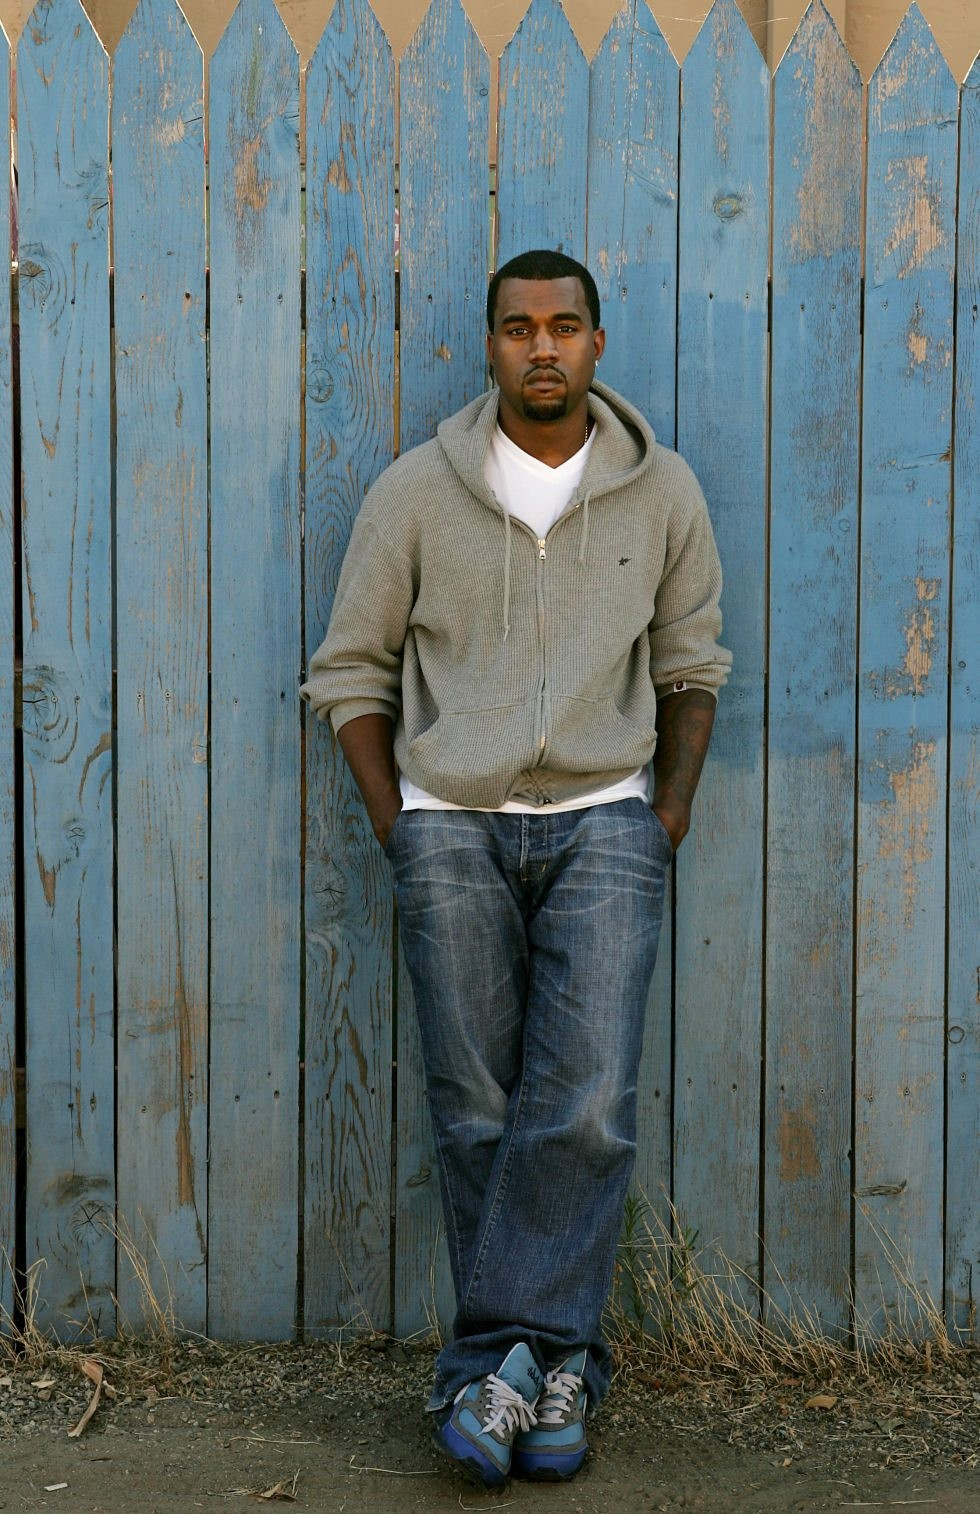 Kanye West in the Stash x Nike Air Max BW